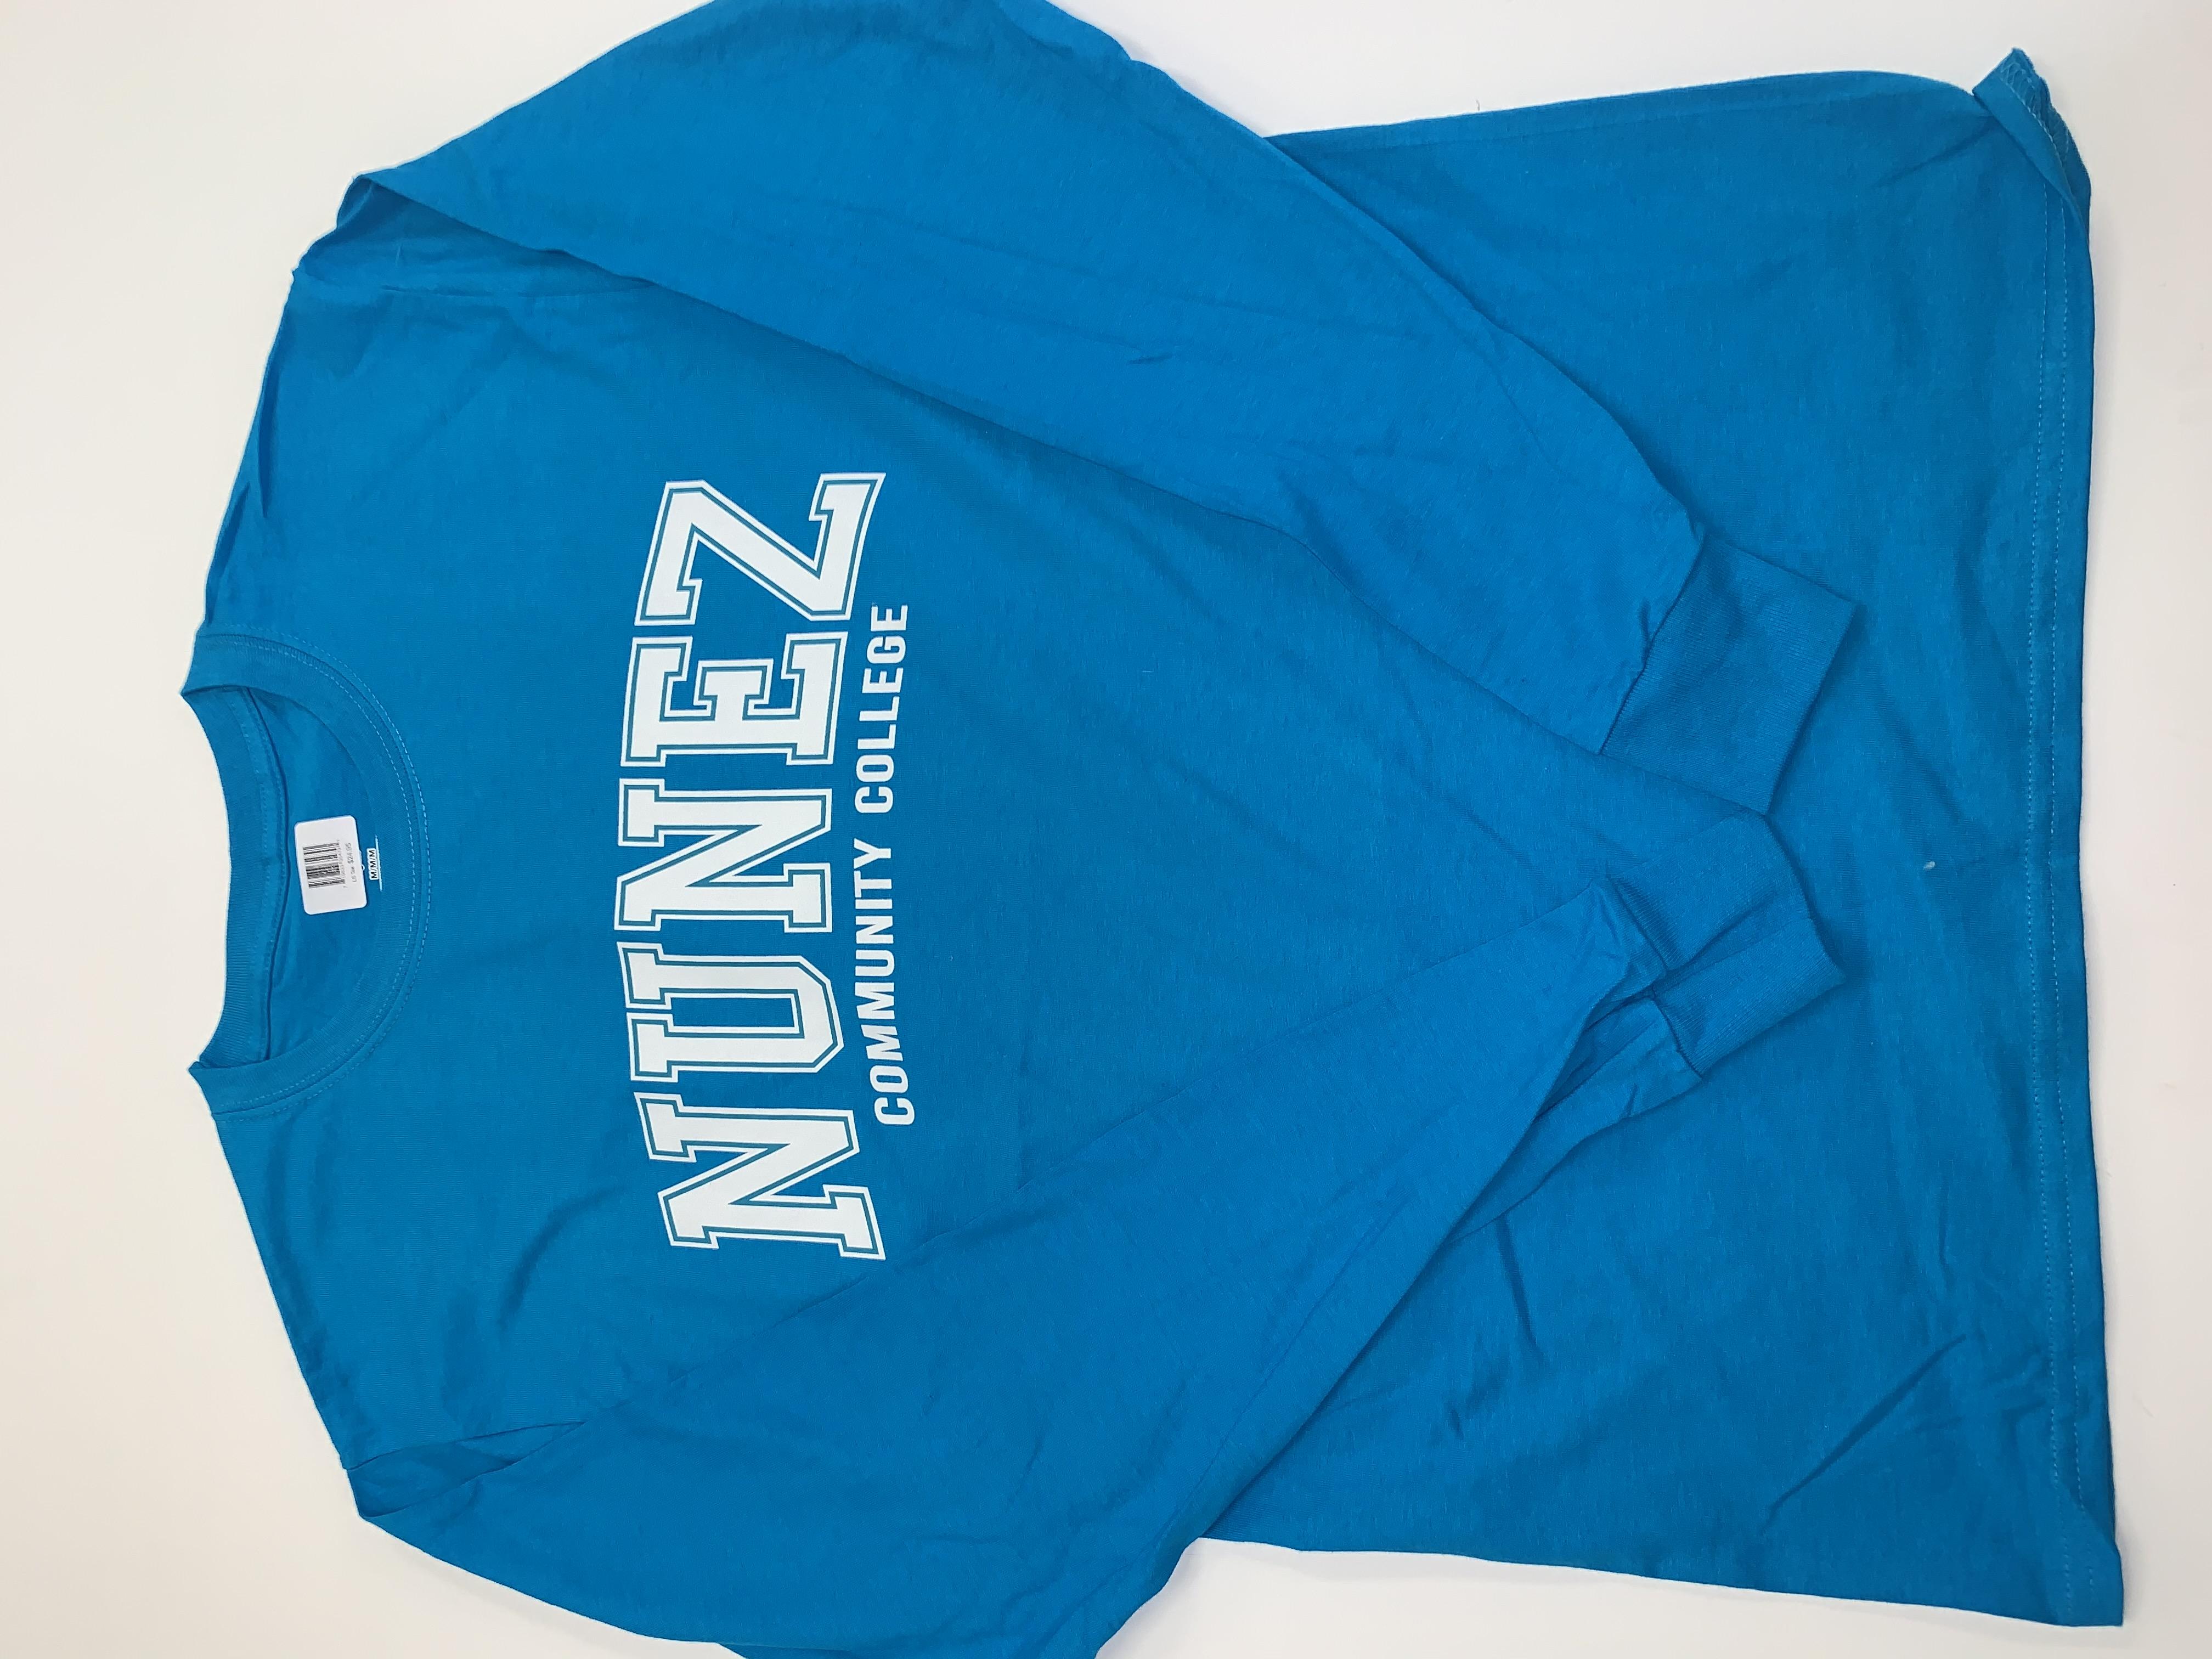 Hanes 100% Preshrunk Cotton Long Sleeve T-Shirt